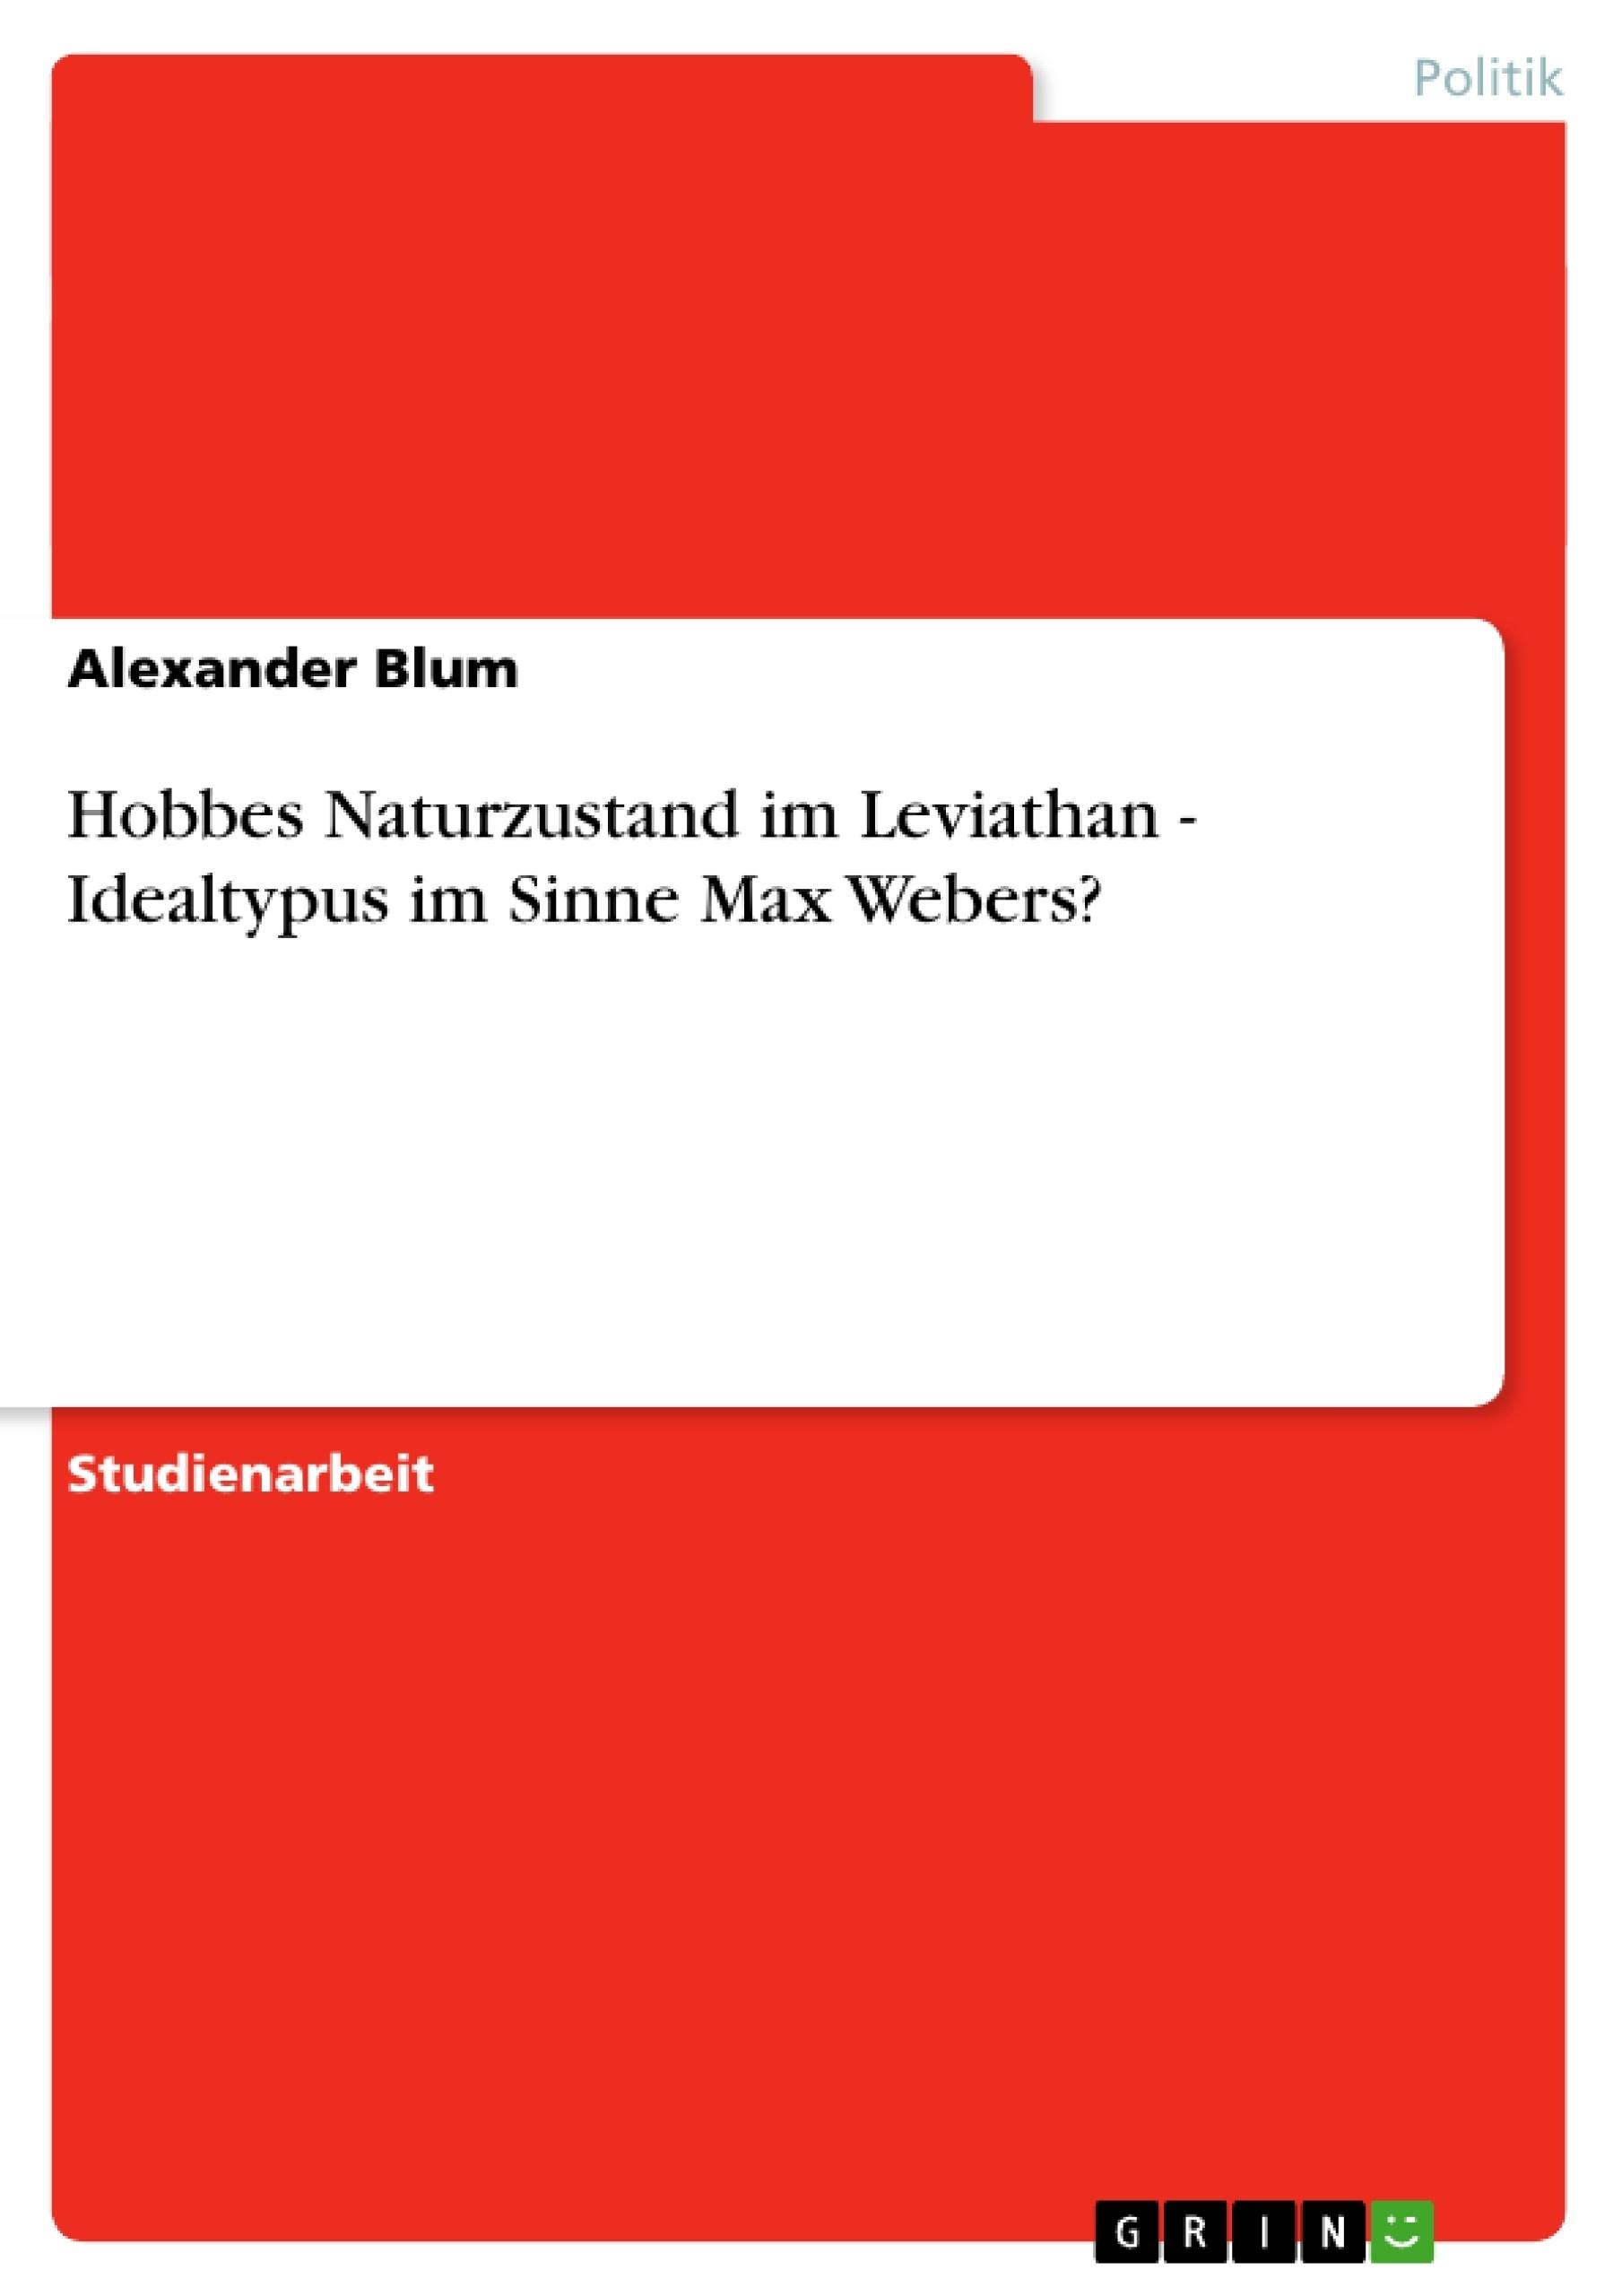 Titel: Hobbes Naturzustand im Leviathan - Idealtypus im Sinne Max Webers?